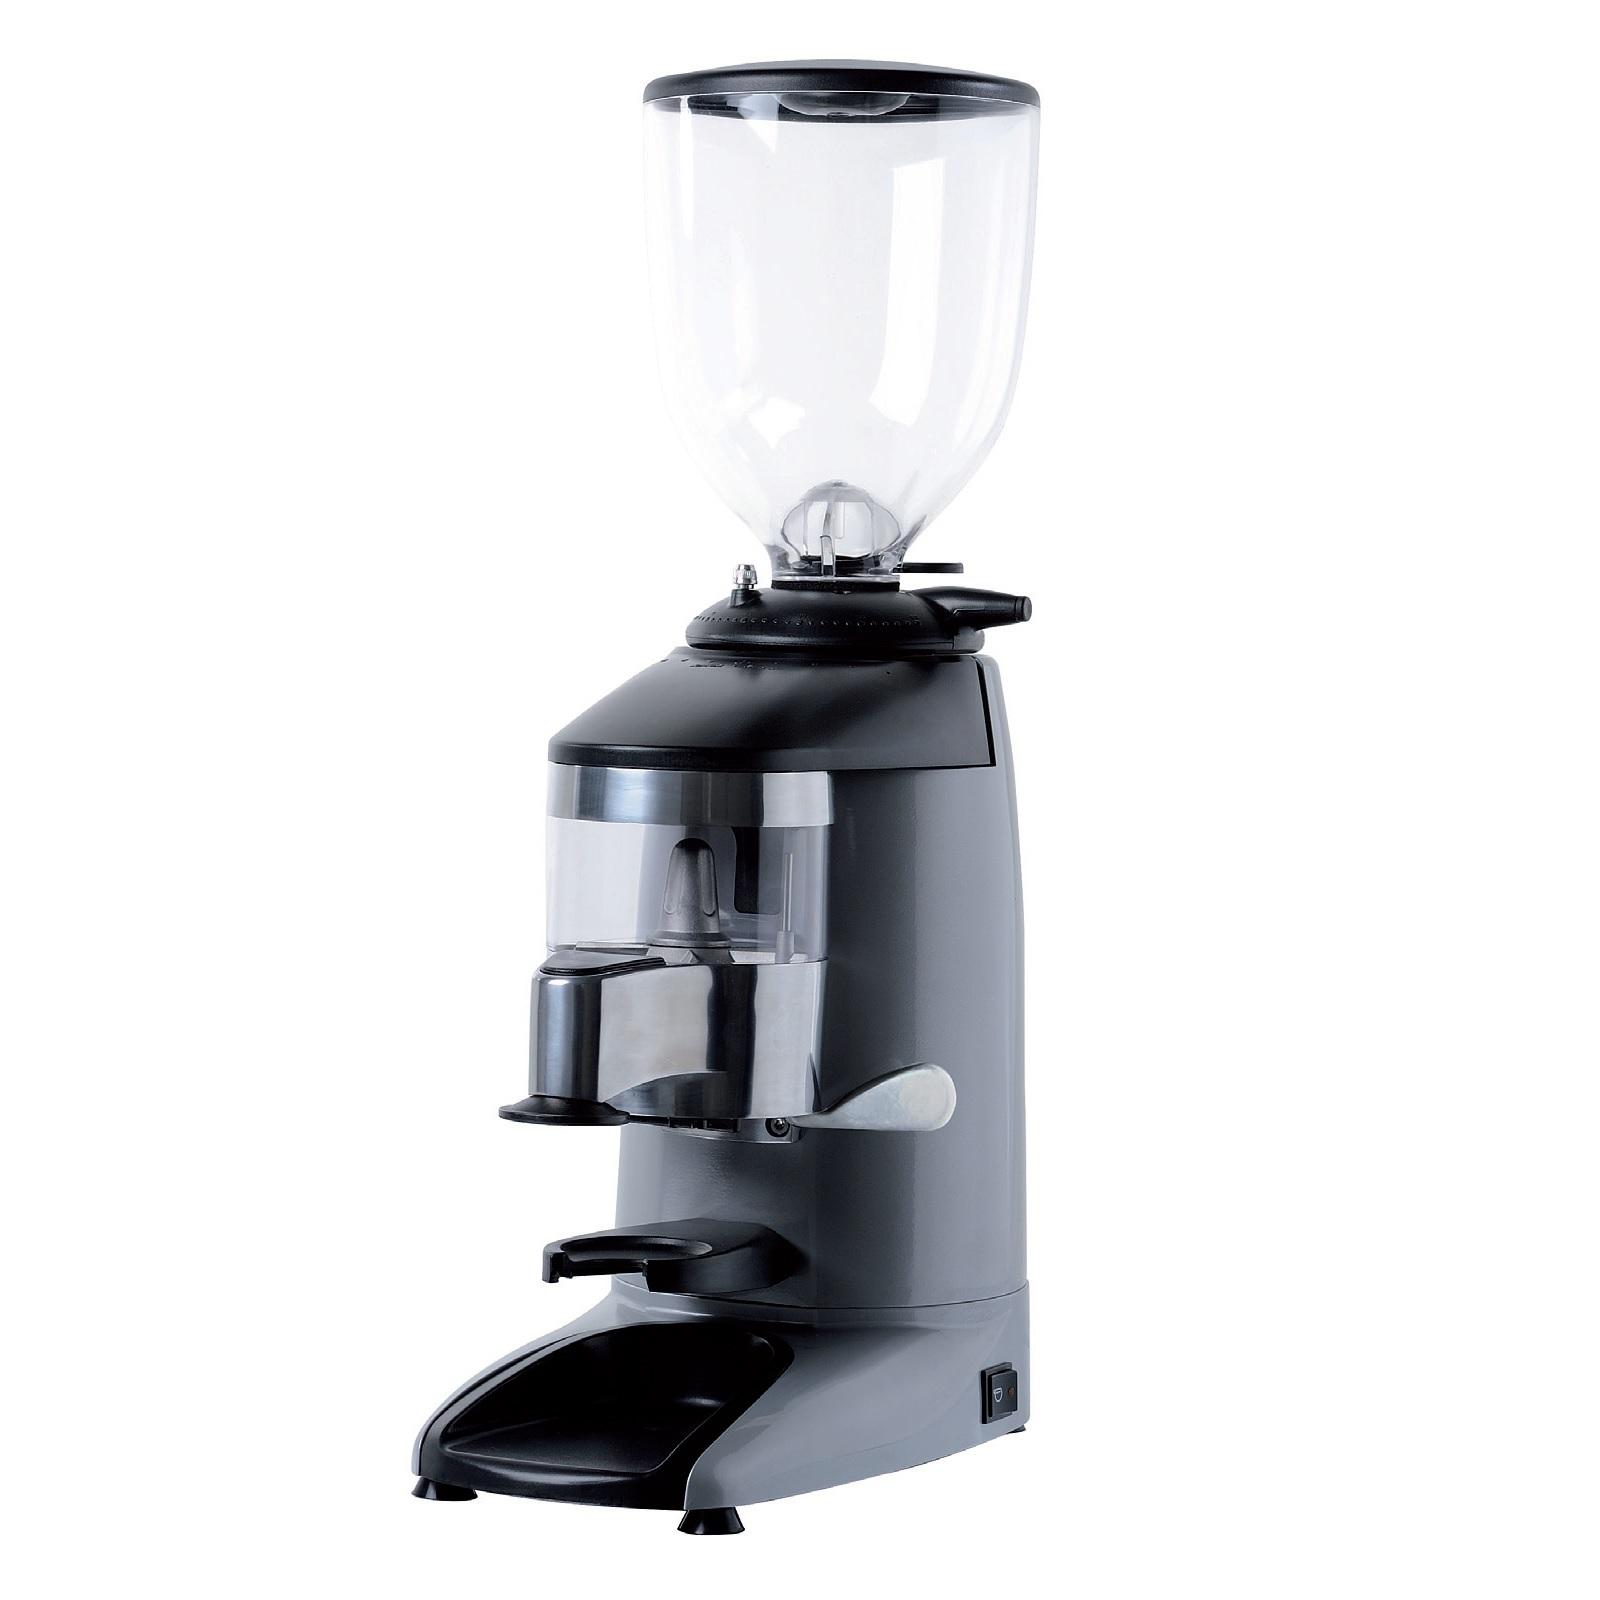 Eurogat K6 Automatic Μύλος Άλεσης Καφέ Με Διανεμητή Δόσης - Μαχαίρια: Ø64mm (Χρώ επαγγελματικός εξοπλισμός   μηχανές καφέ   συσκευές για bar   μύλοι αλέσεως καφέ